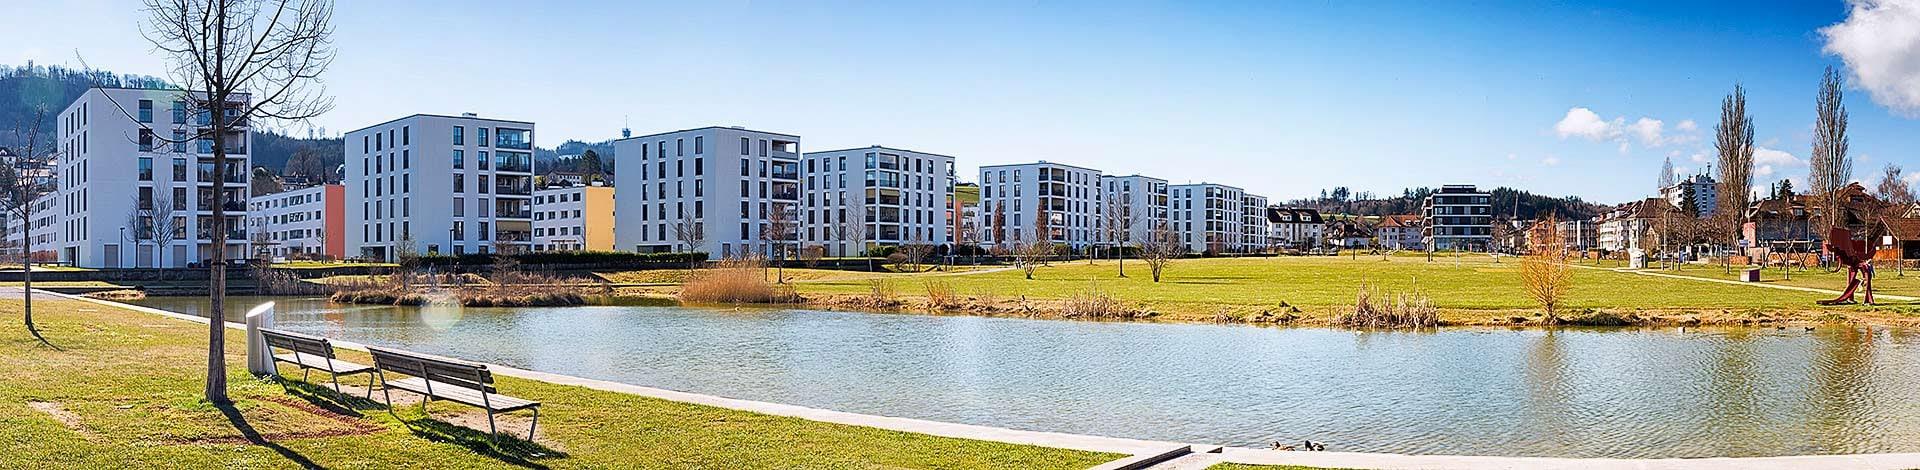 Berne-ouest - Liebefeld